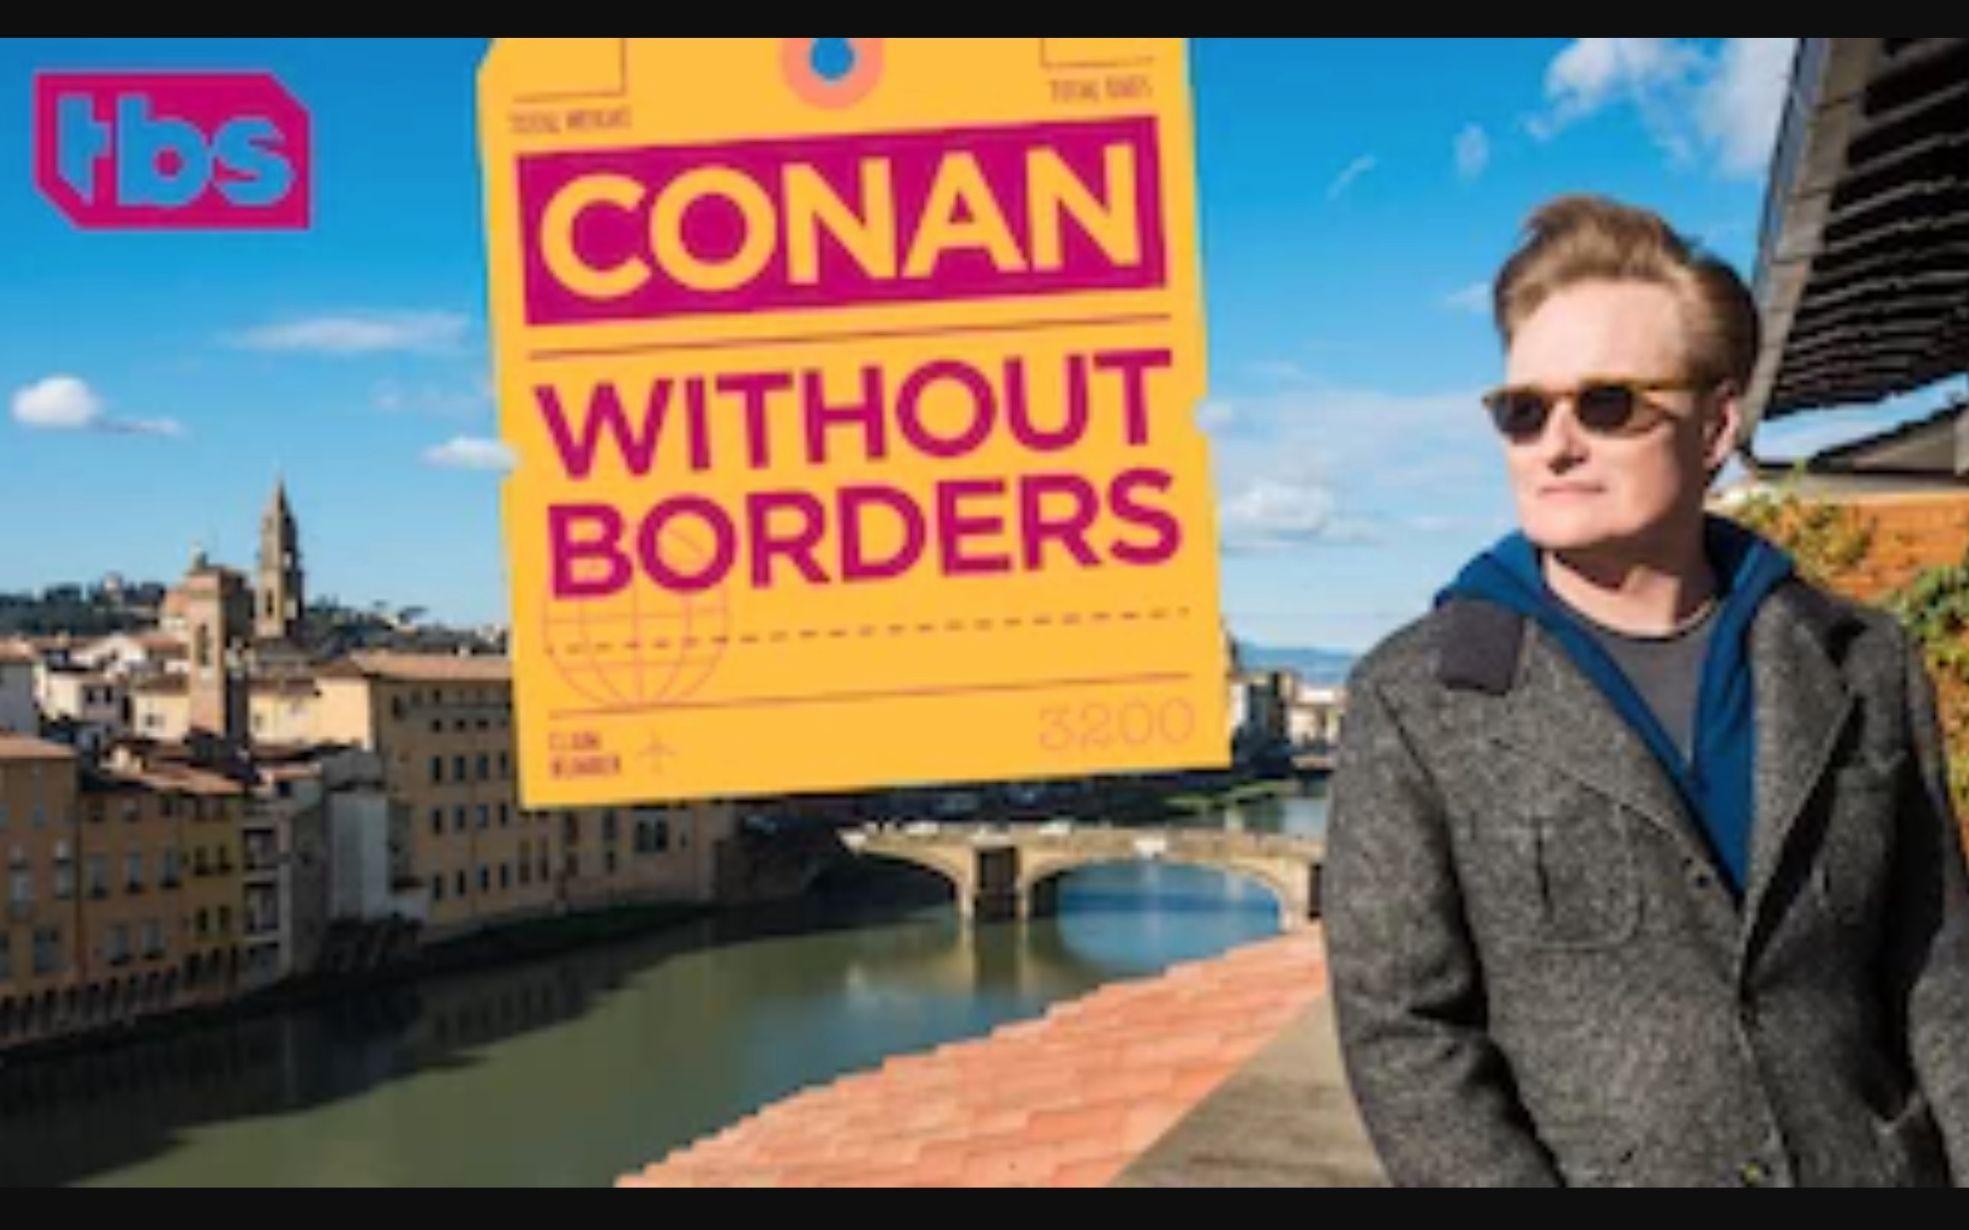 【Netflix】柯南游世界:韓國 官方雙語字幕 Conan Without Borders Korea (2018)_嗶哩嗶哩 (゜-゜)つロ 干杯~-bilibili